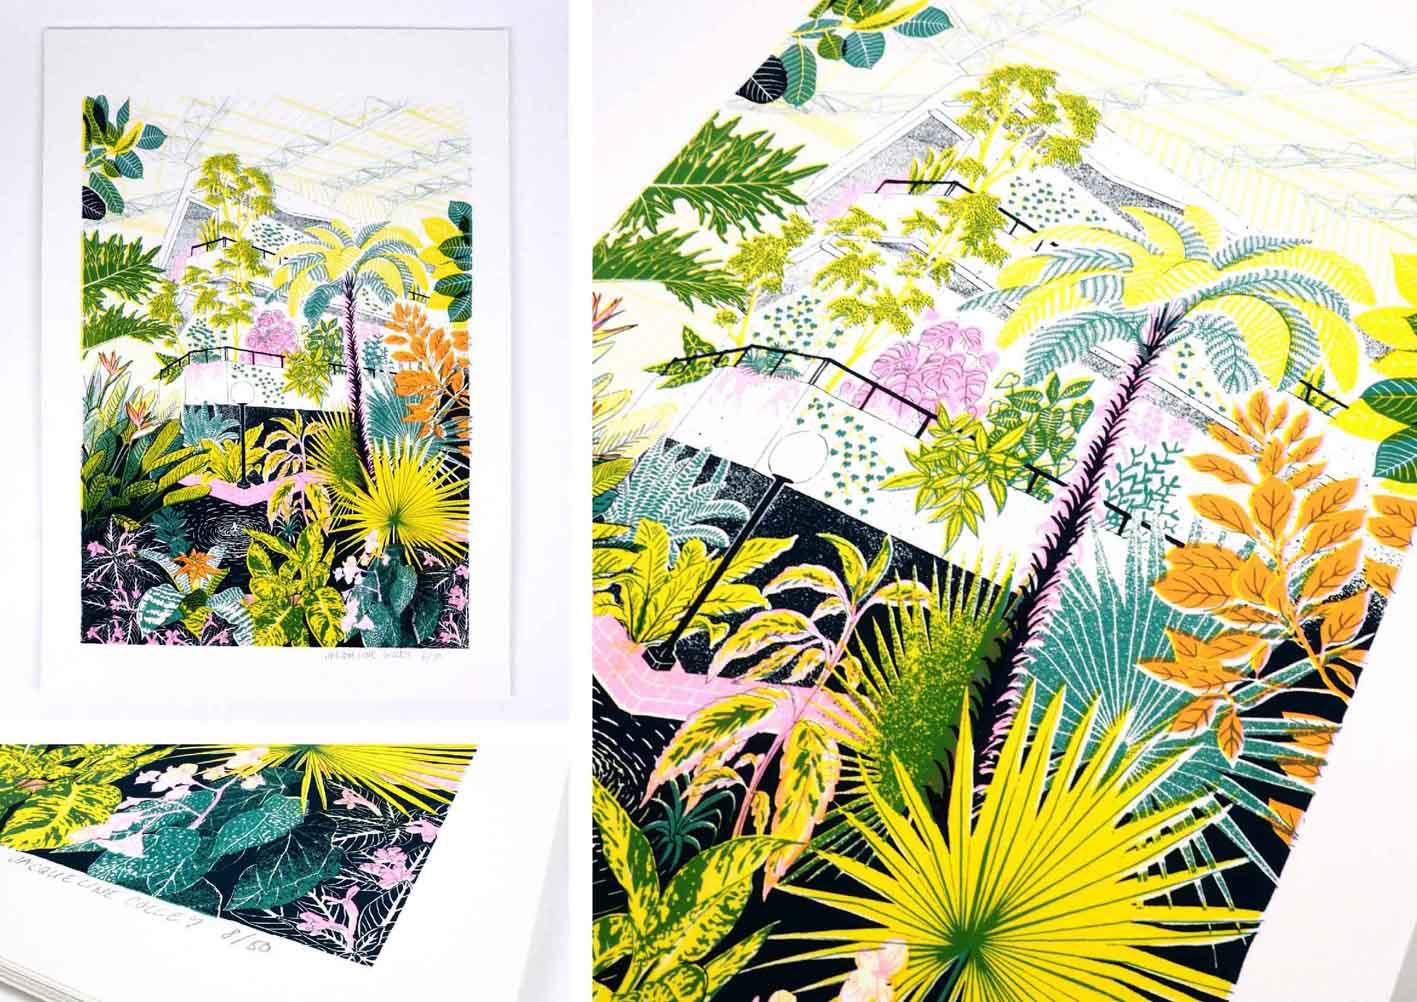 Barbican-Art-Screen-Print-1-sm.jpg